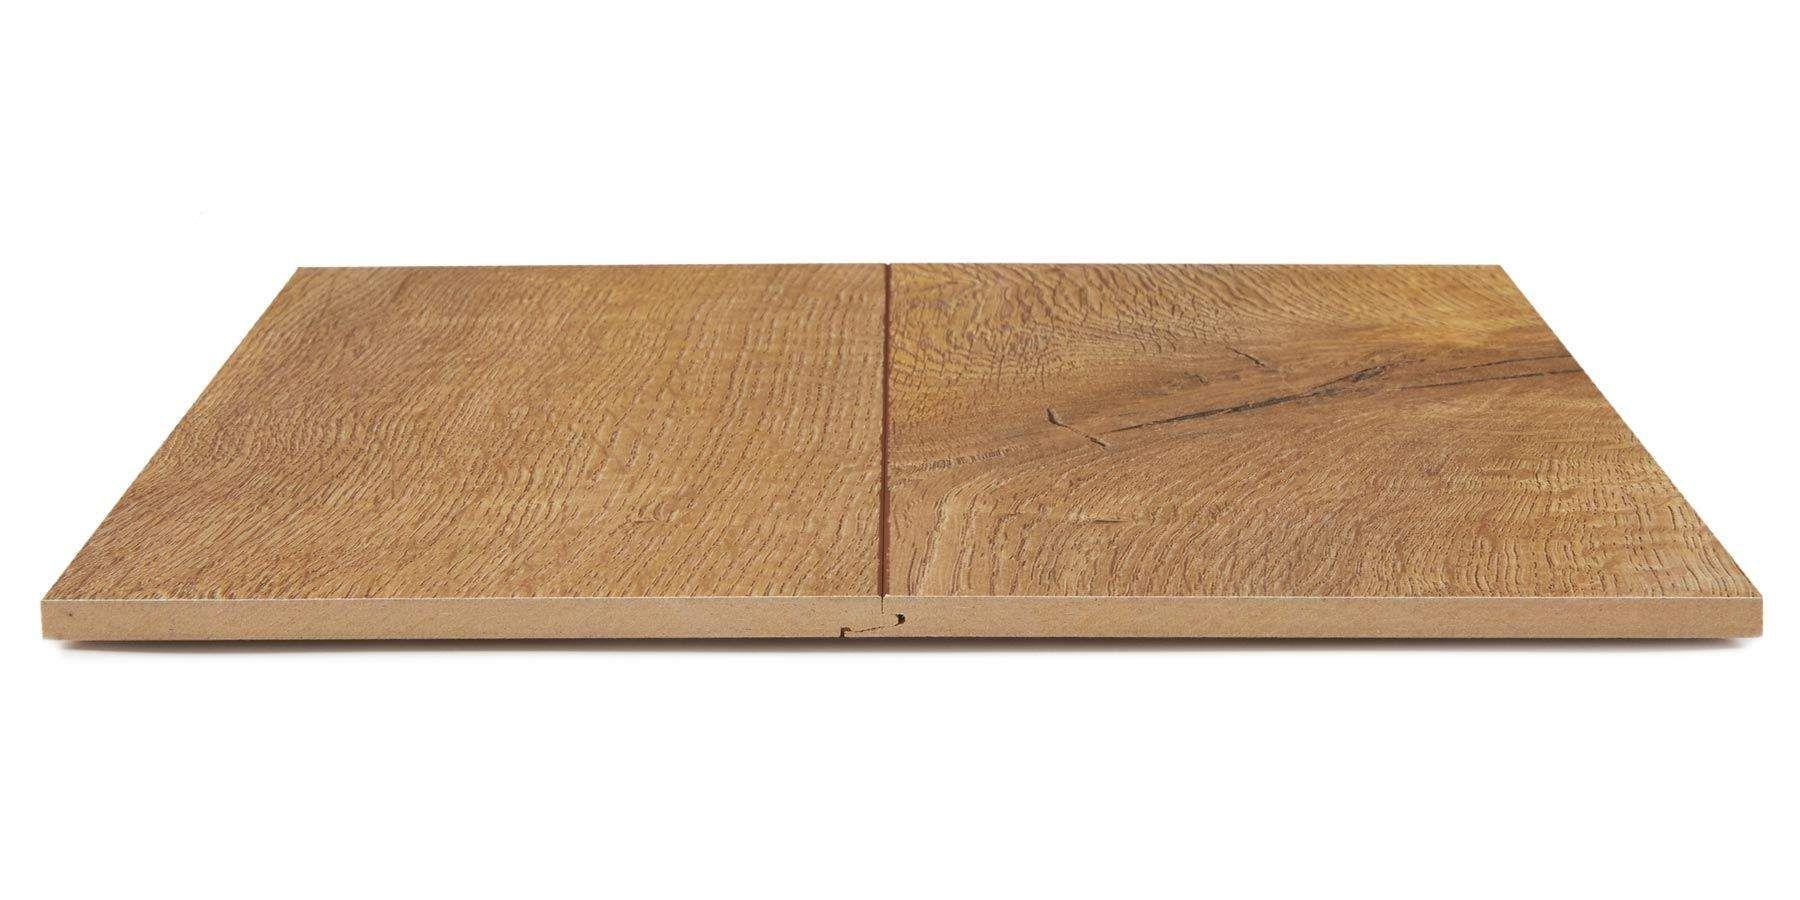 Albany Park Honeytone Oak Laminate Wood Laminate Flooring Wood Laminate Rustic Wood Floors